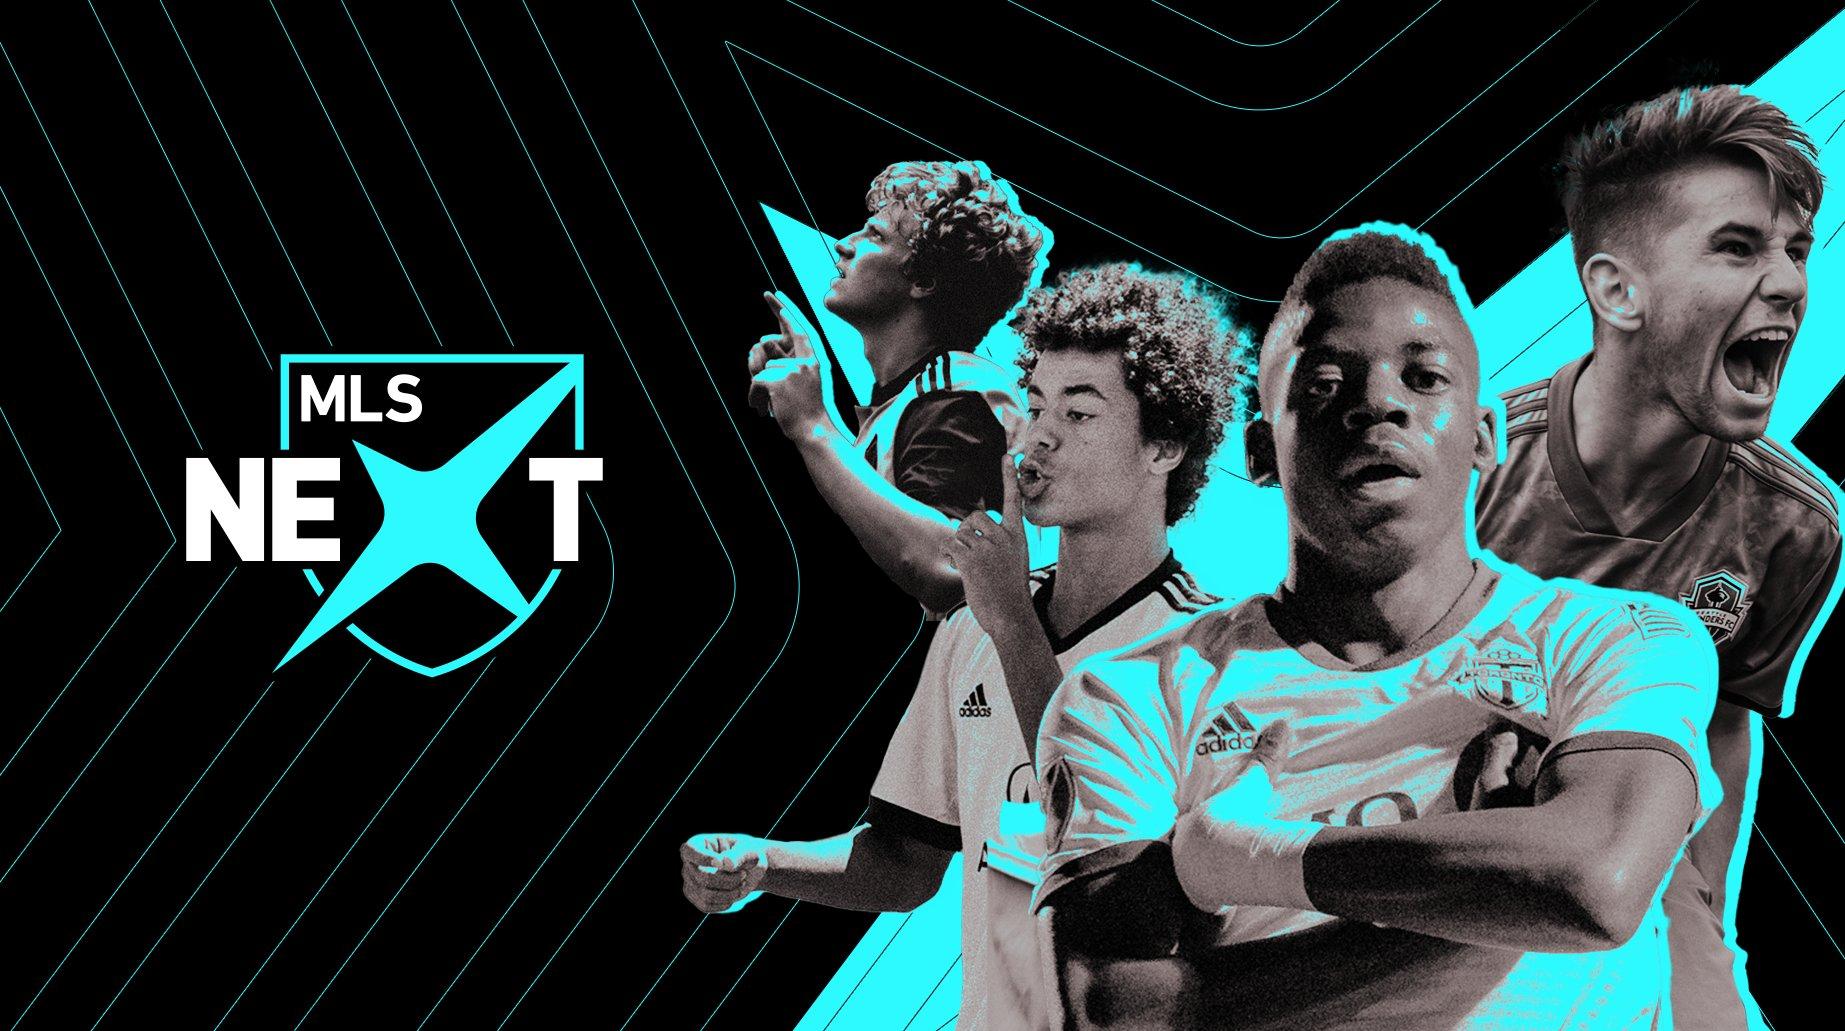 MLS NEXT: o ambicioso projeto para revelar jogadores nos EUA